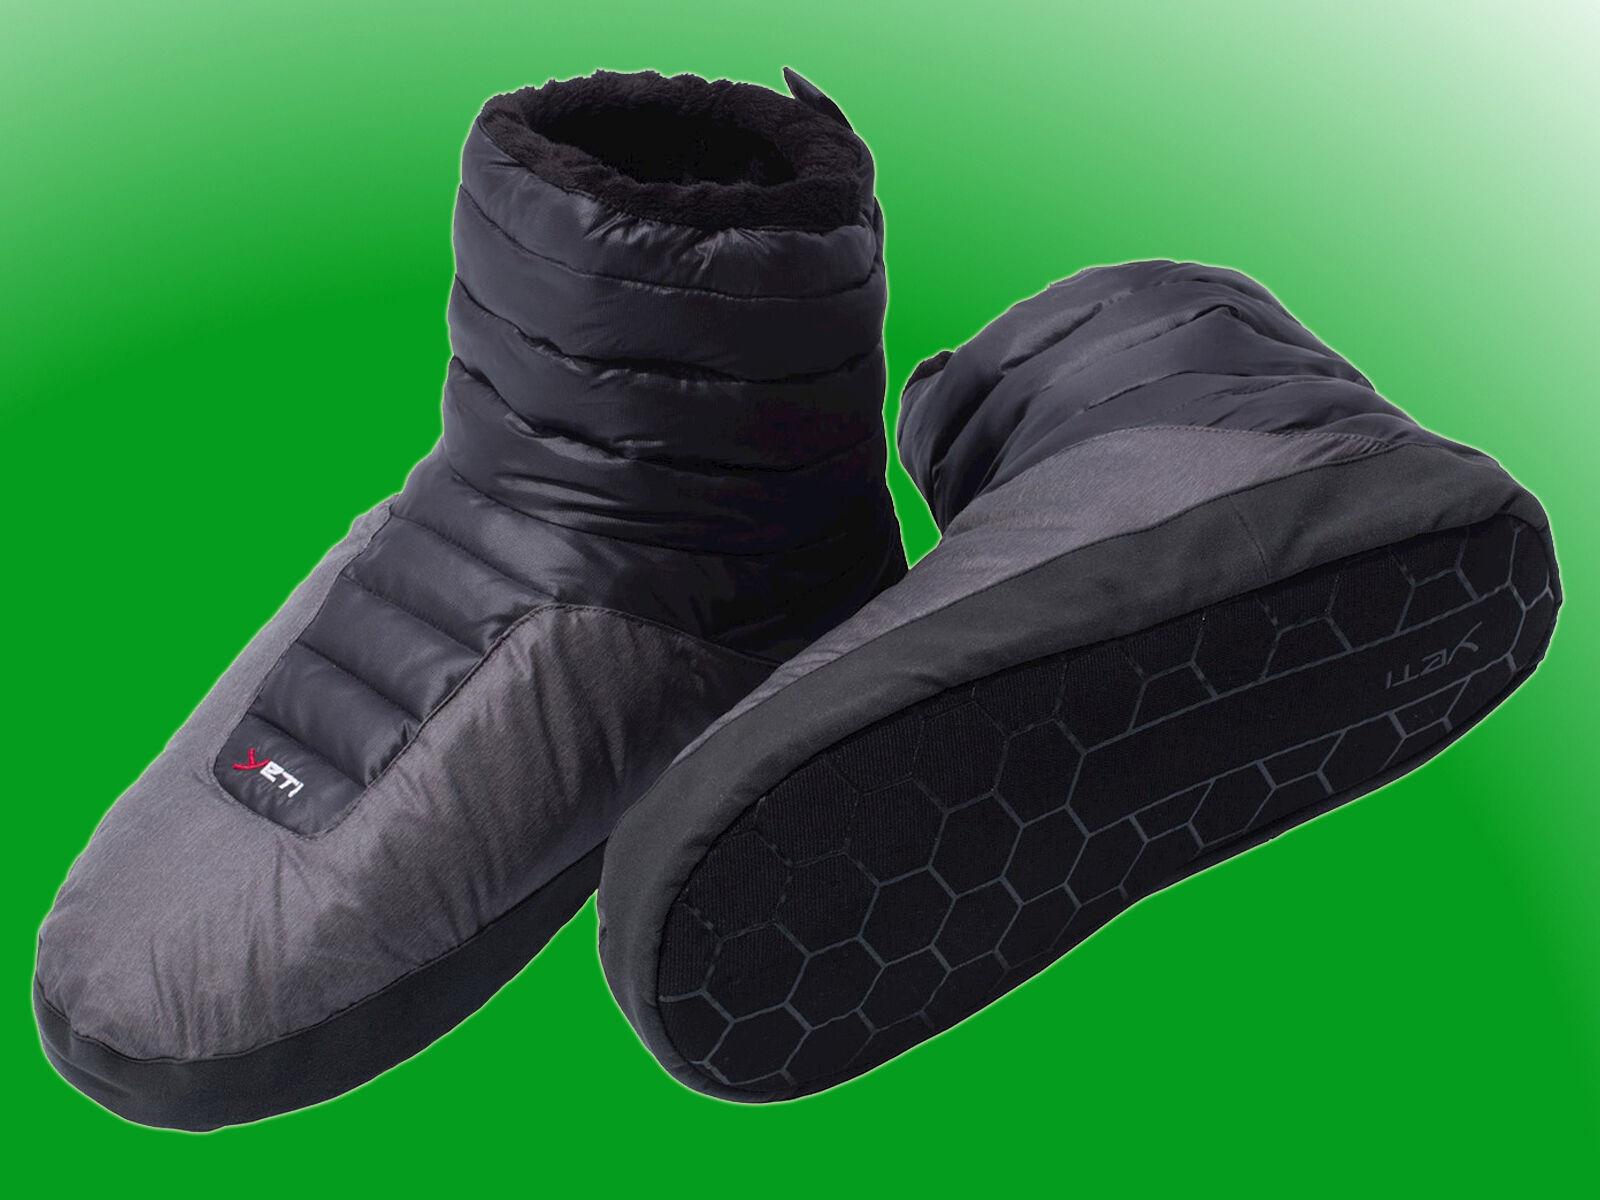 Yeti Sundown PIUMINO Stivali, capanne scarpe, pantofole, Outdoor, DOWN STIVALI